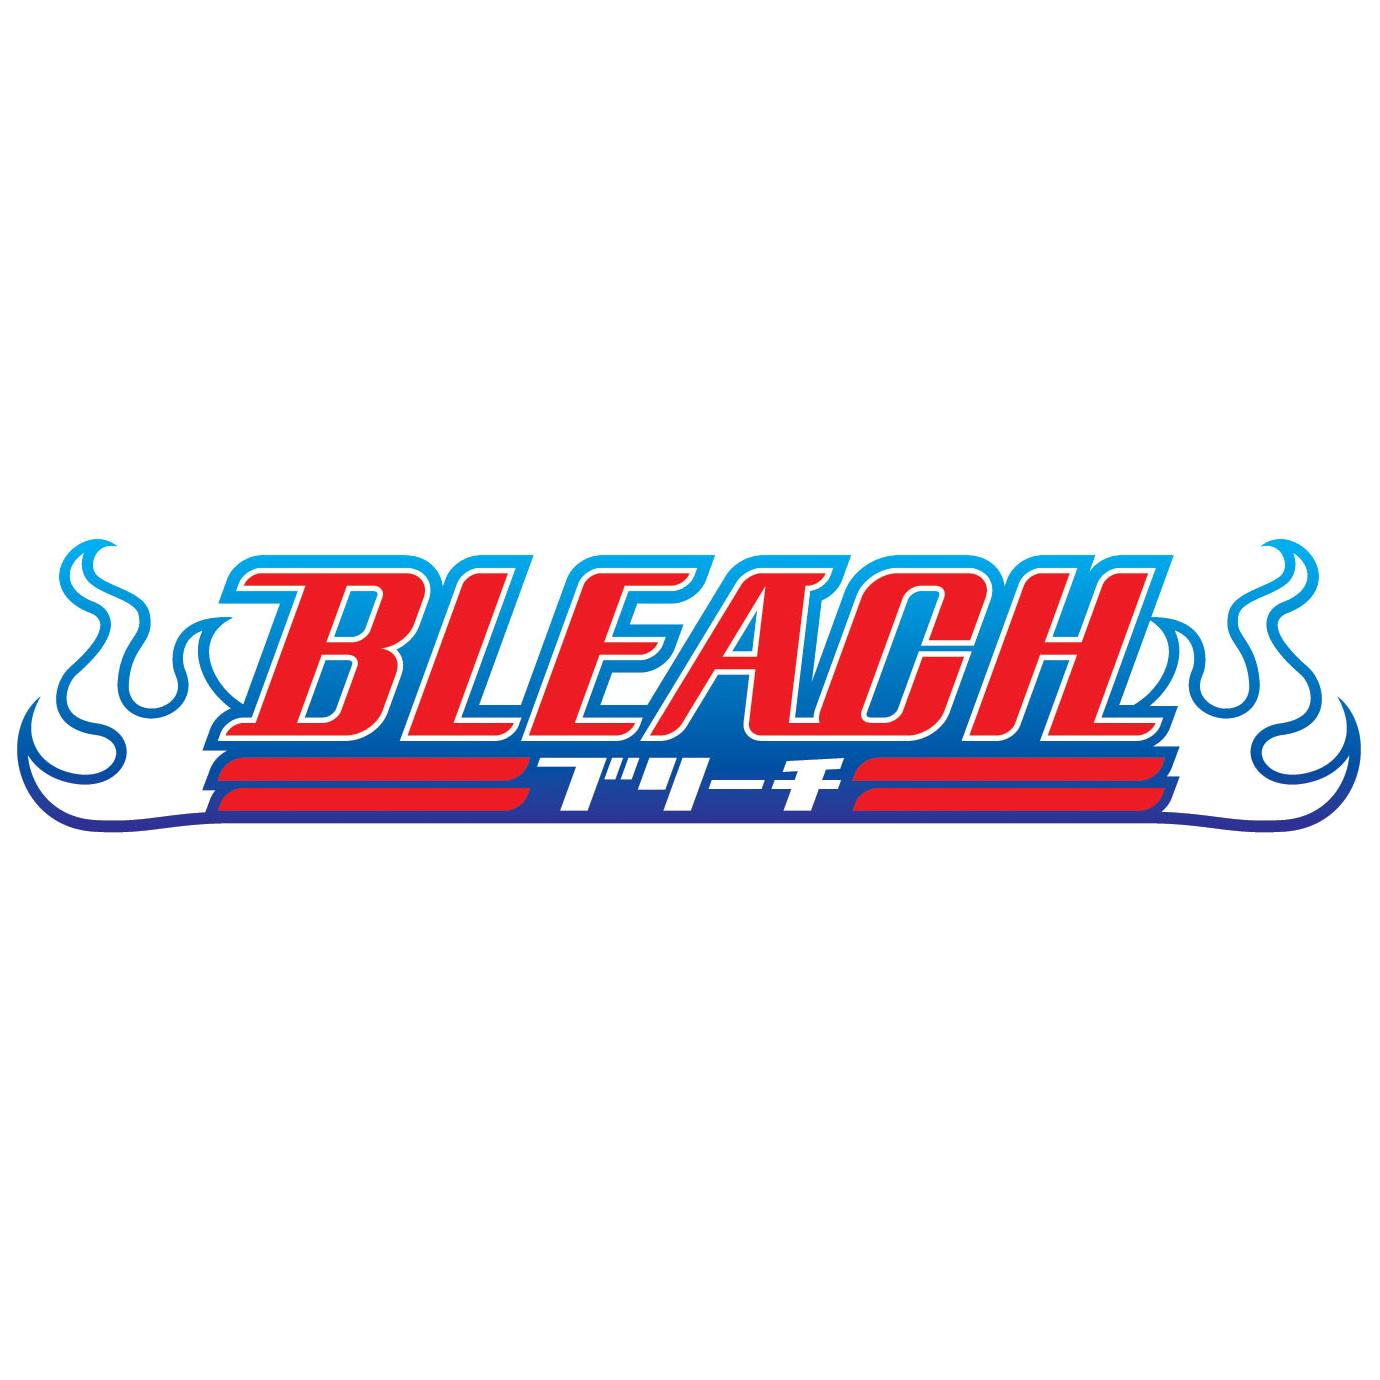 Image Of Bleach Manga Logo Bleach Anime Vice Bleach Logo Bleach Anime Bleach